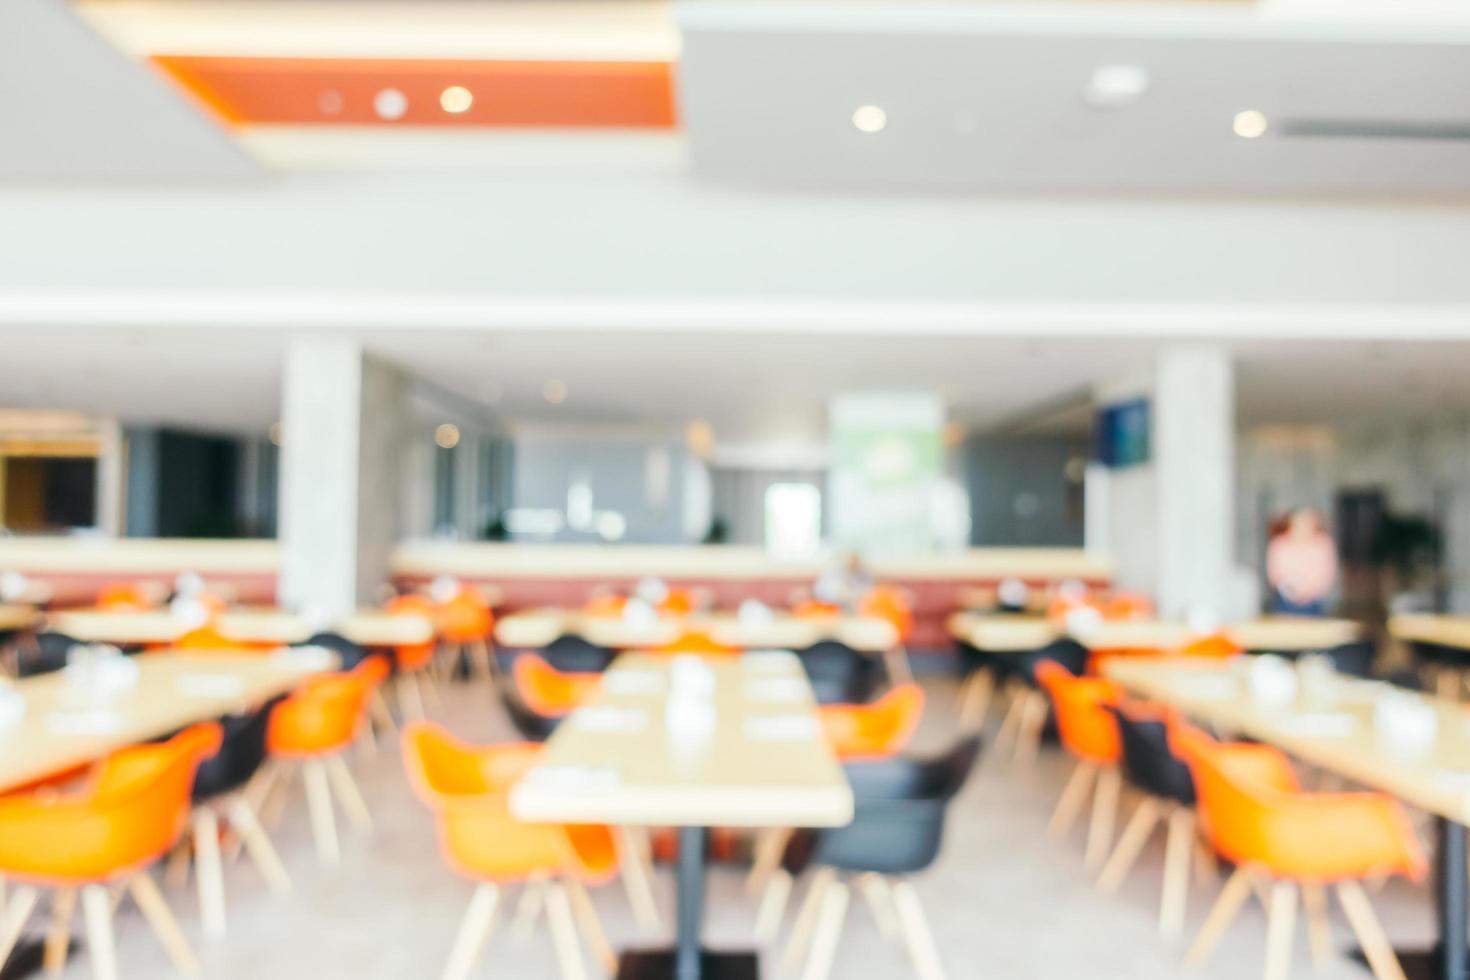 Abstract blur restaurant photo